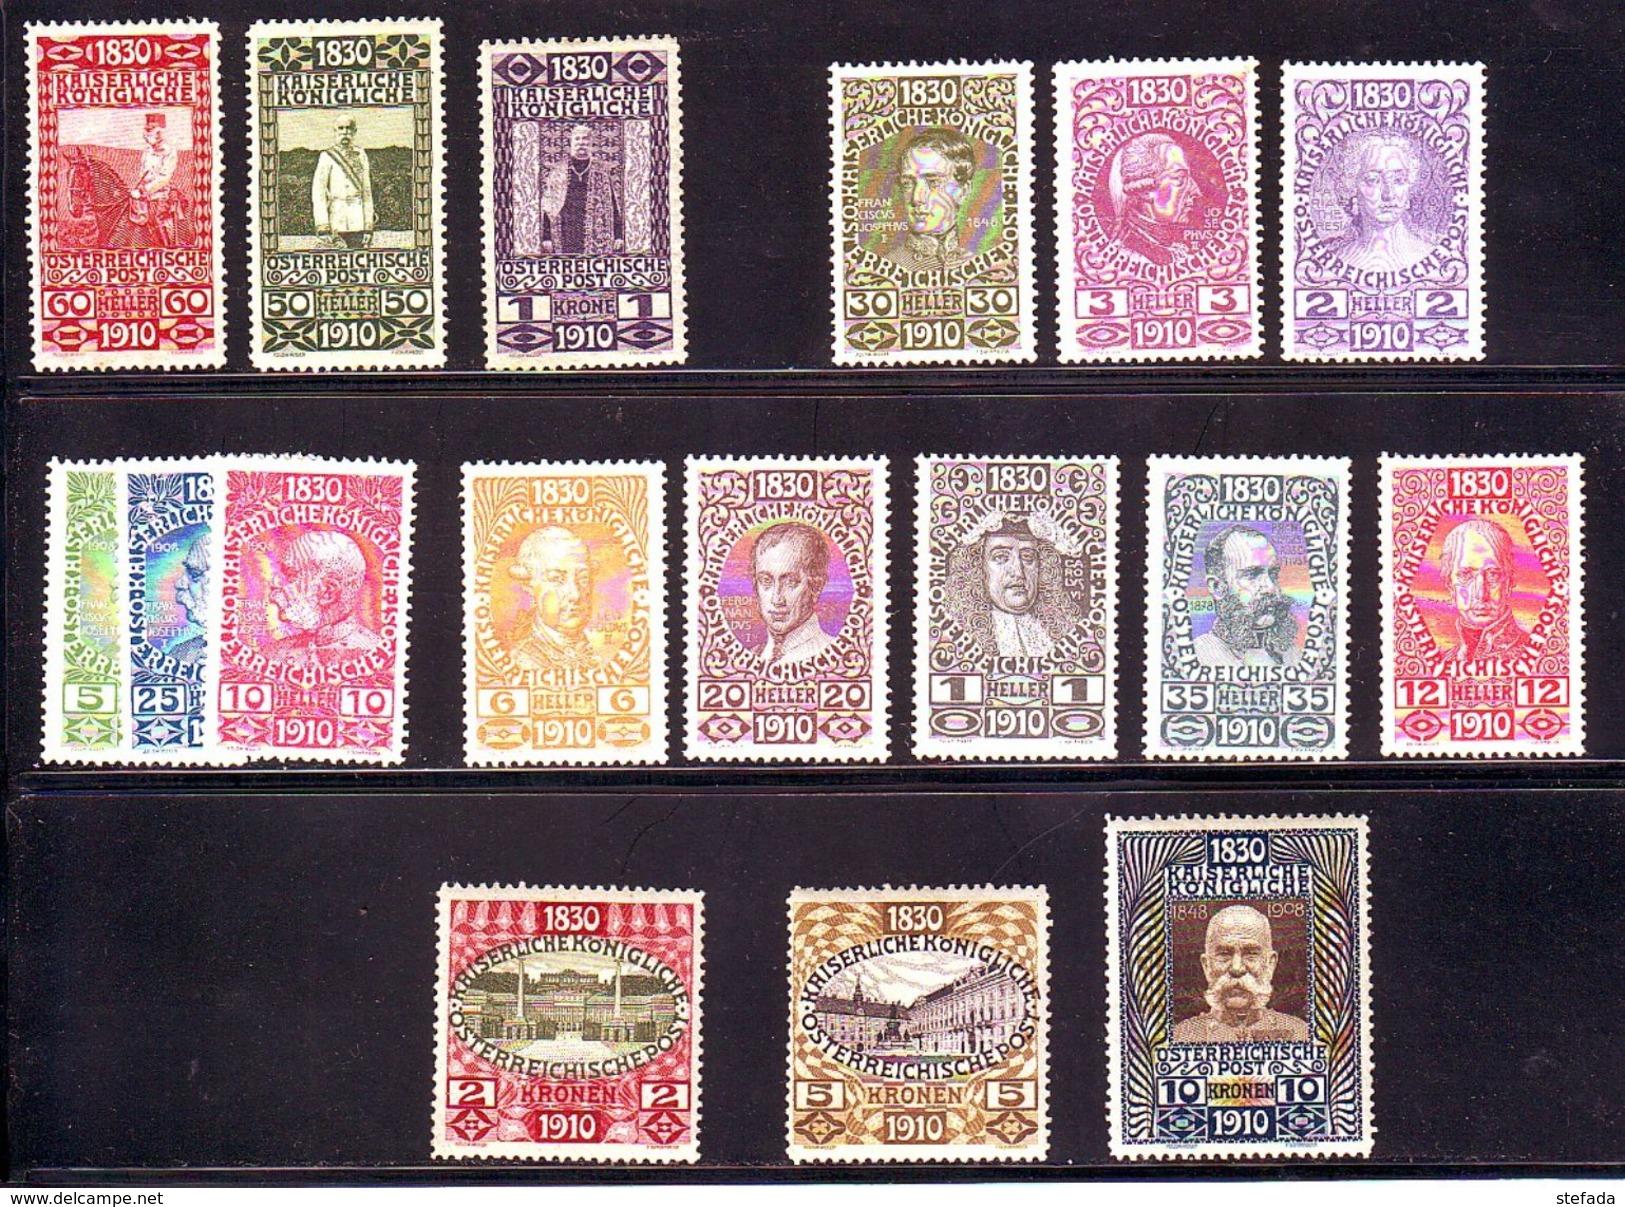 AUSTRIA AUTRICHE AUSTRIAN 1910  80° Compleanno FRANCESCO GIUSEPPE  17 Valori Alti MNH** - 1850-1918 Imperium